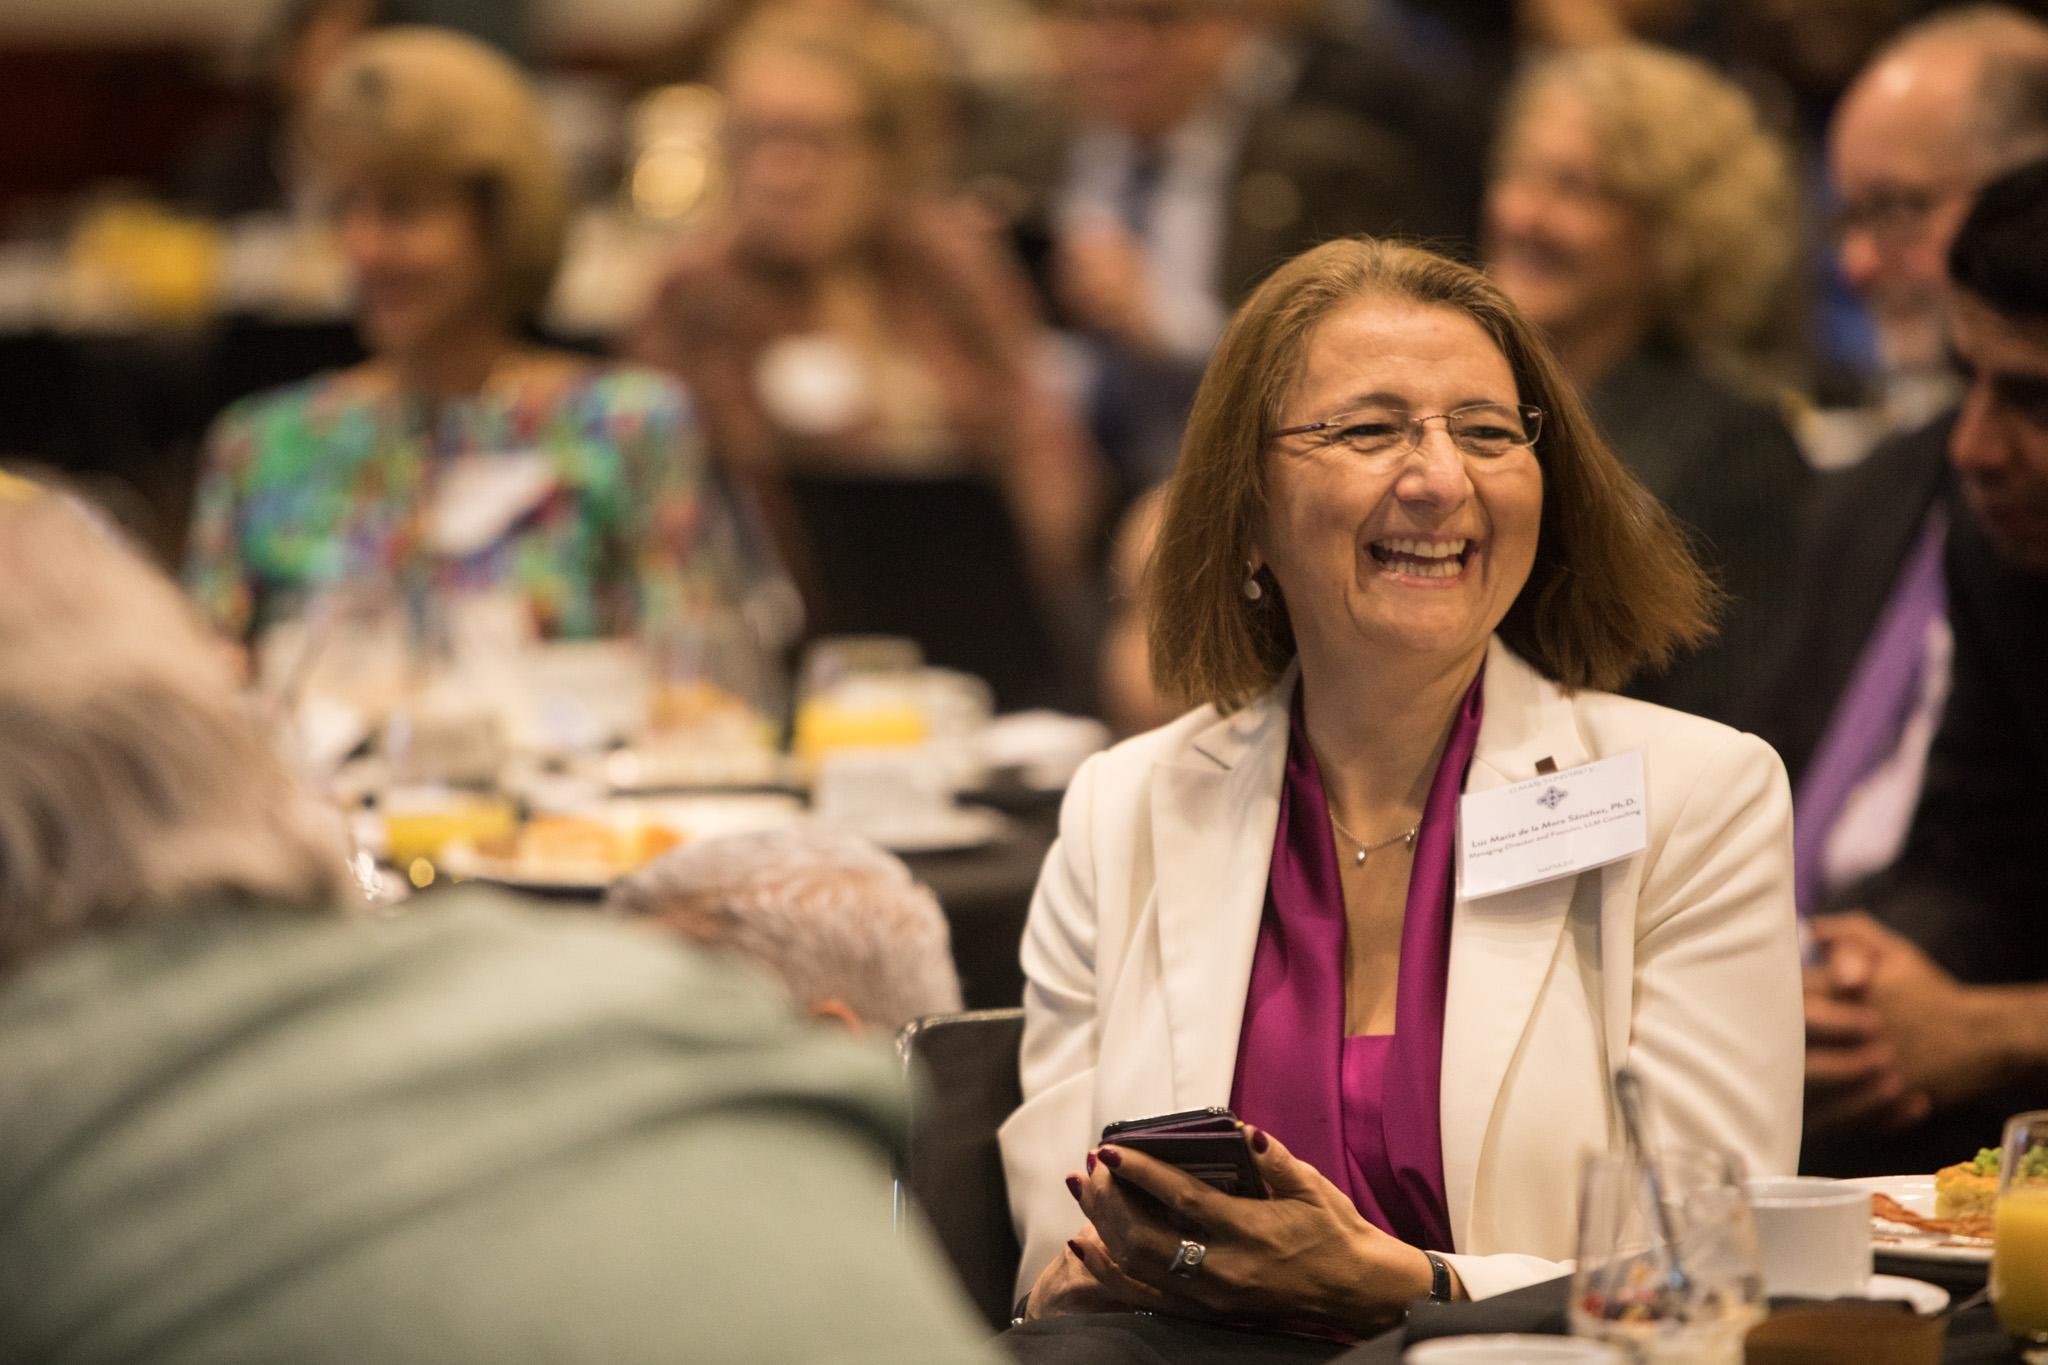 Luz María De La Mora Sánchez laughs during a panel discussion at NAFTA 2.0: The Future of North American Trade at St. Mary's University.